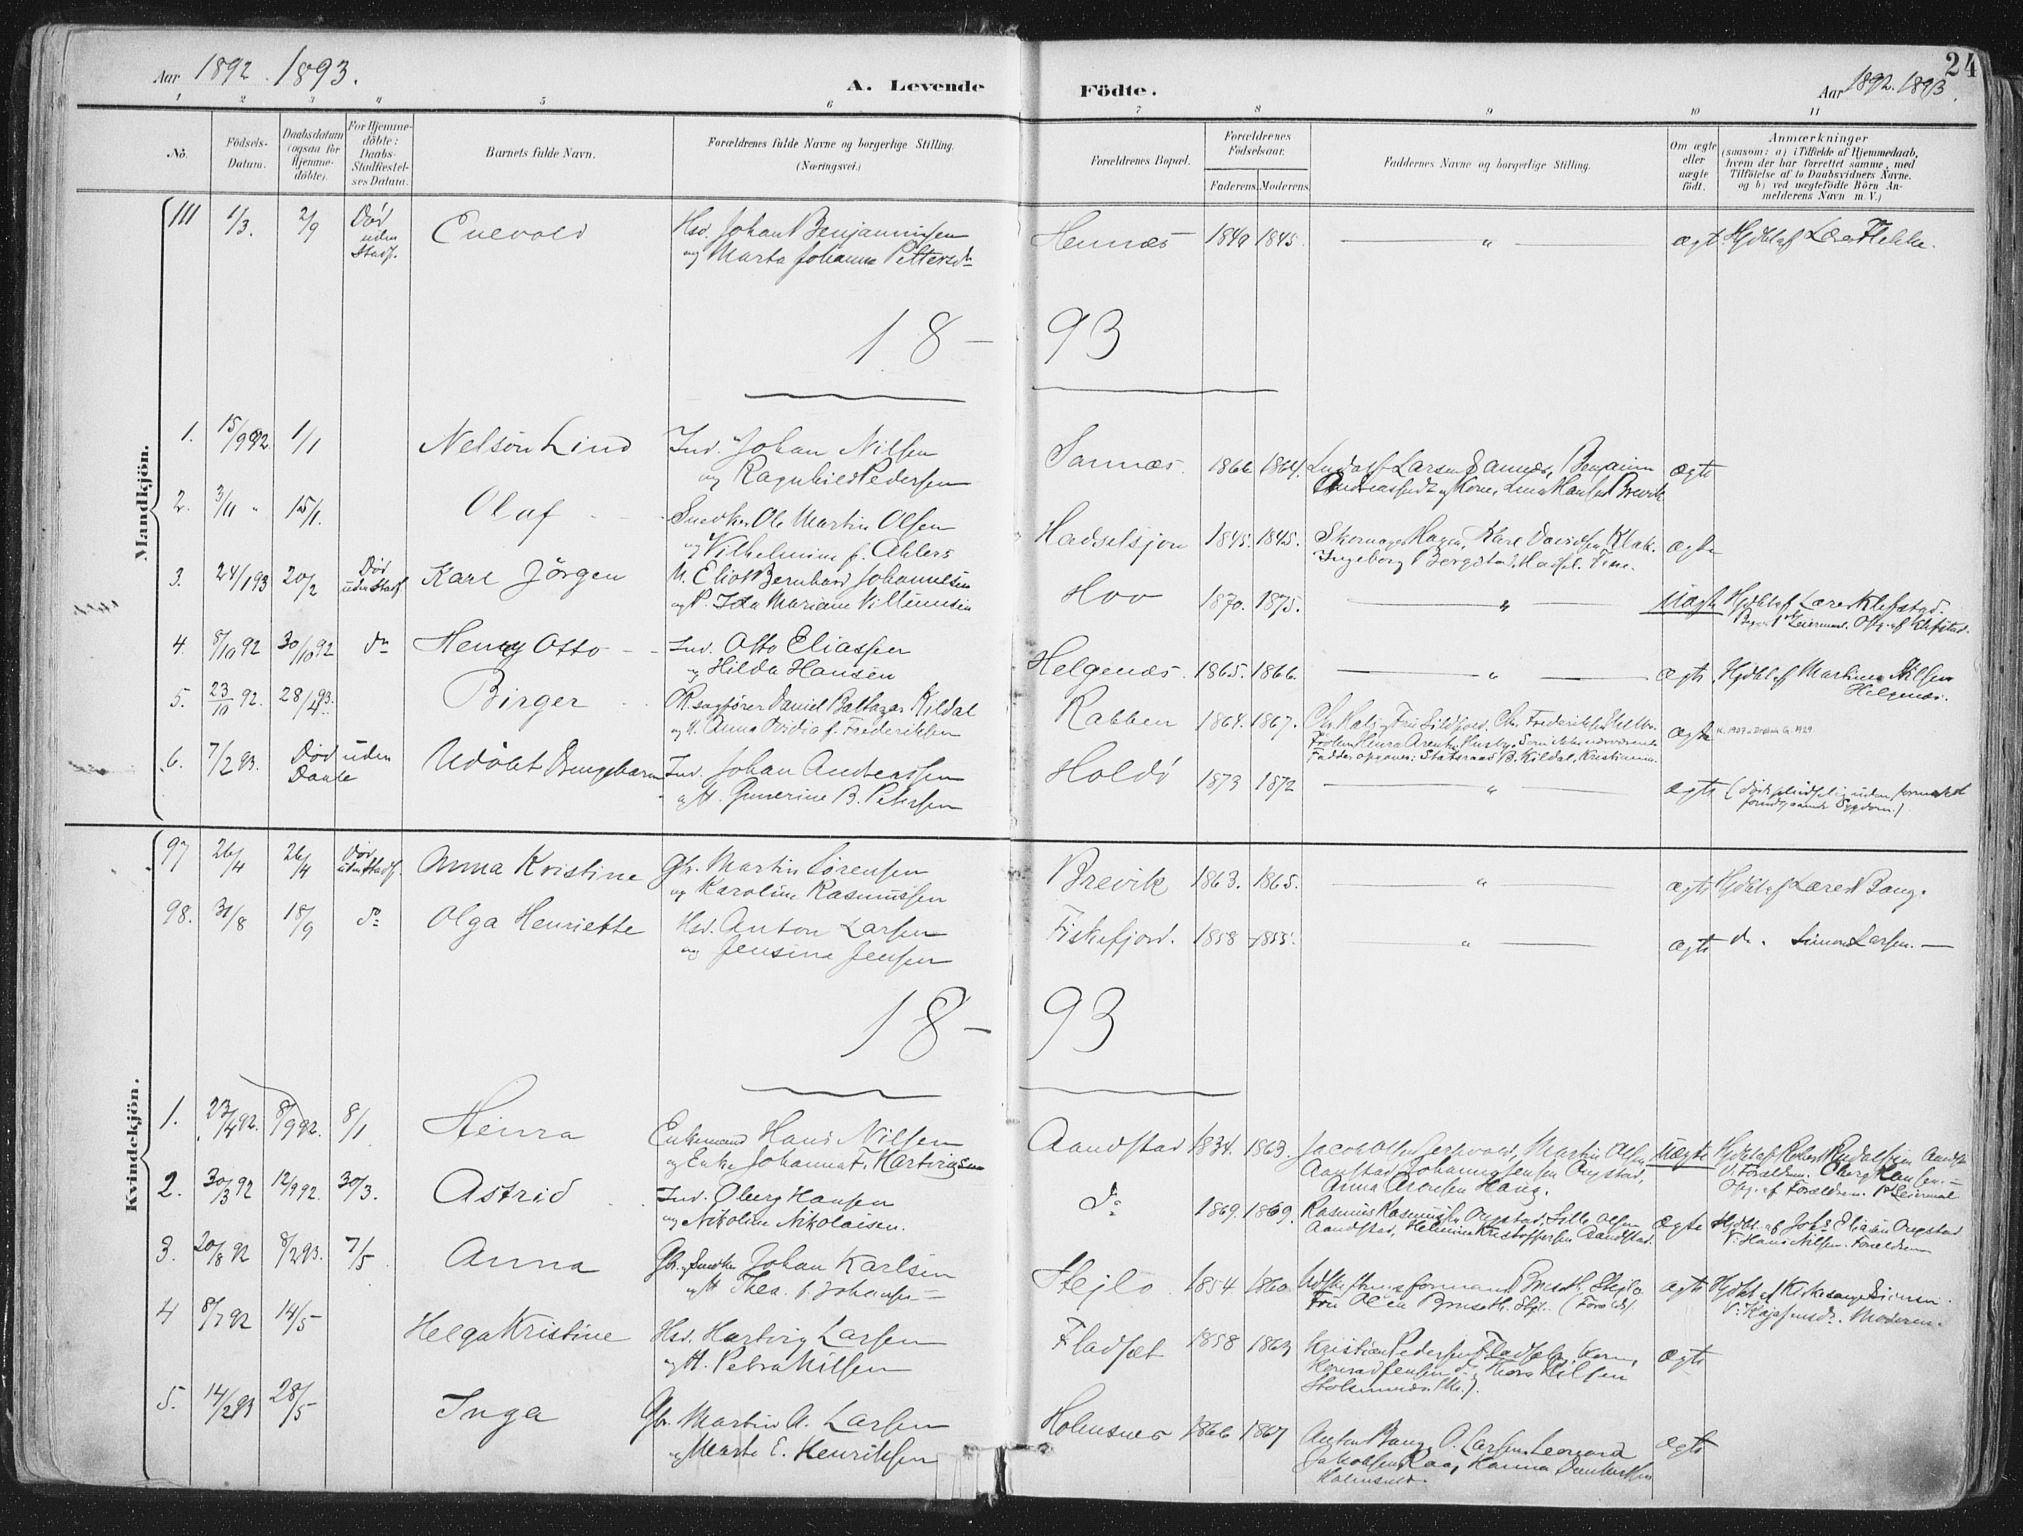 SAT, Ministerialprotokoller, klokkerbøker og fødselsregistre - Nordland, 888/L1246: Ministerialbok nr. 888A12, 1891-1903, s. 24